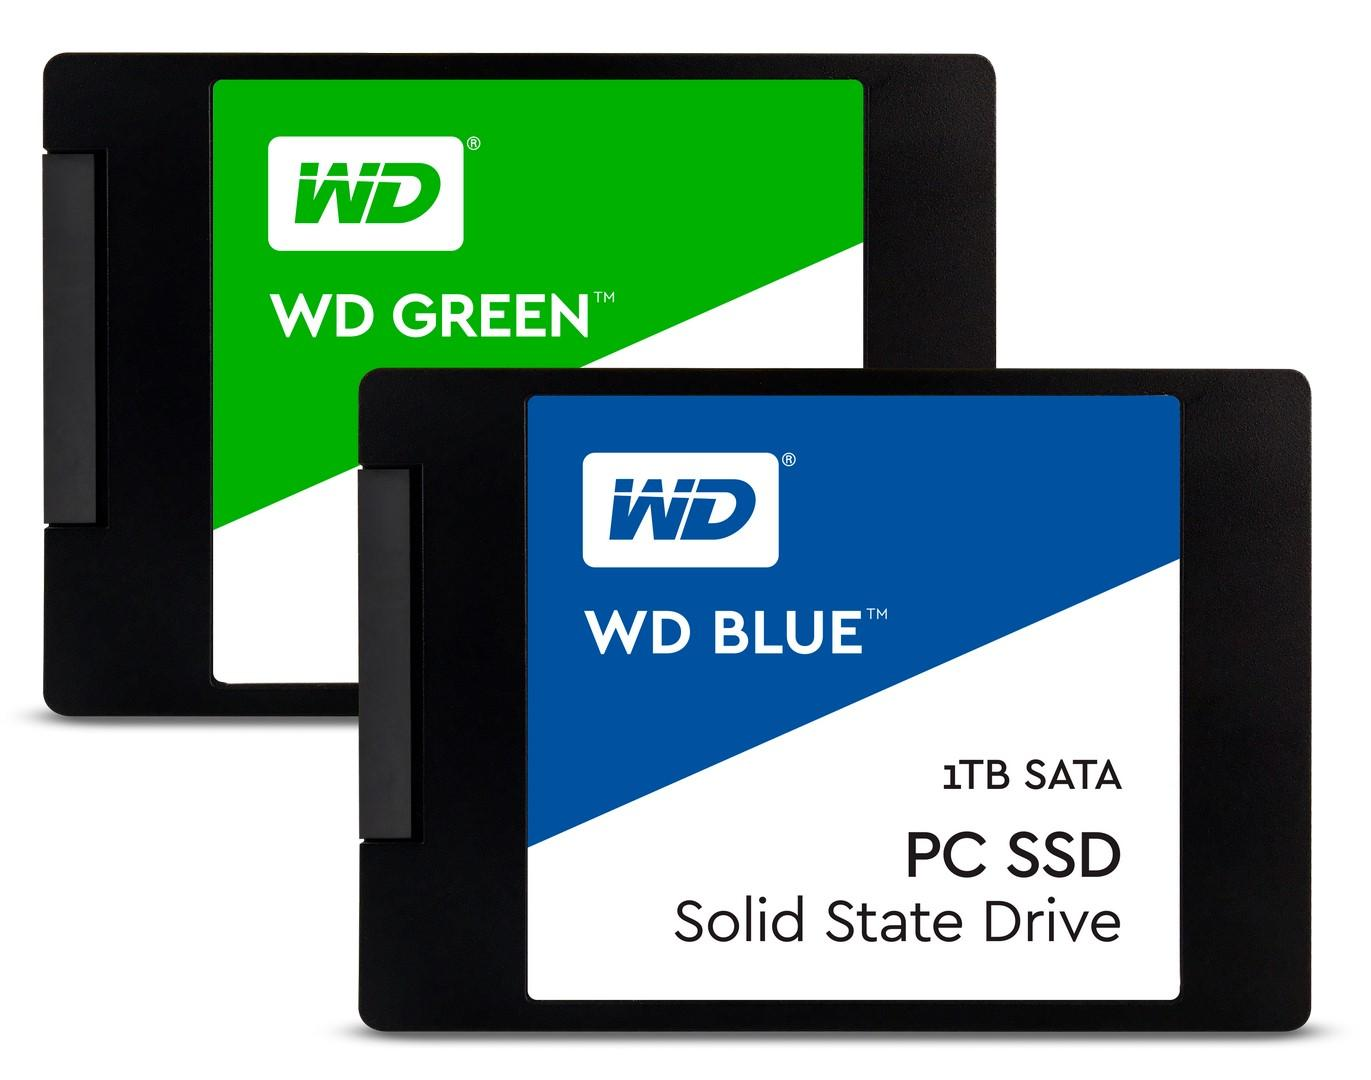 wd-blue-wd-green-sata-3